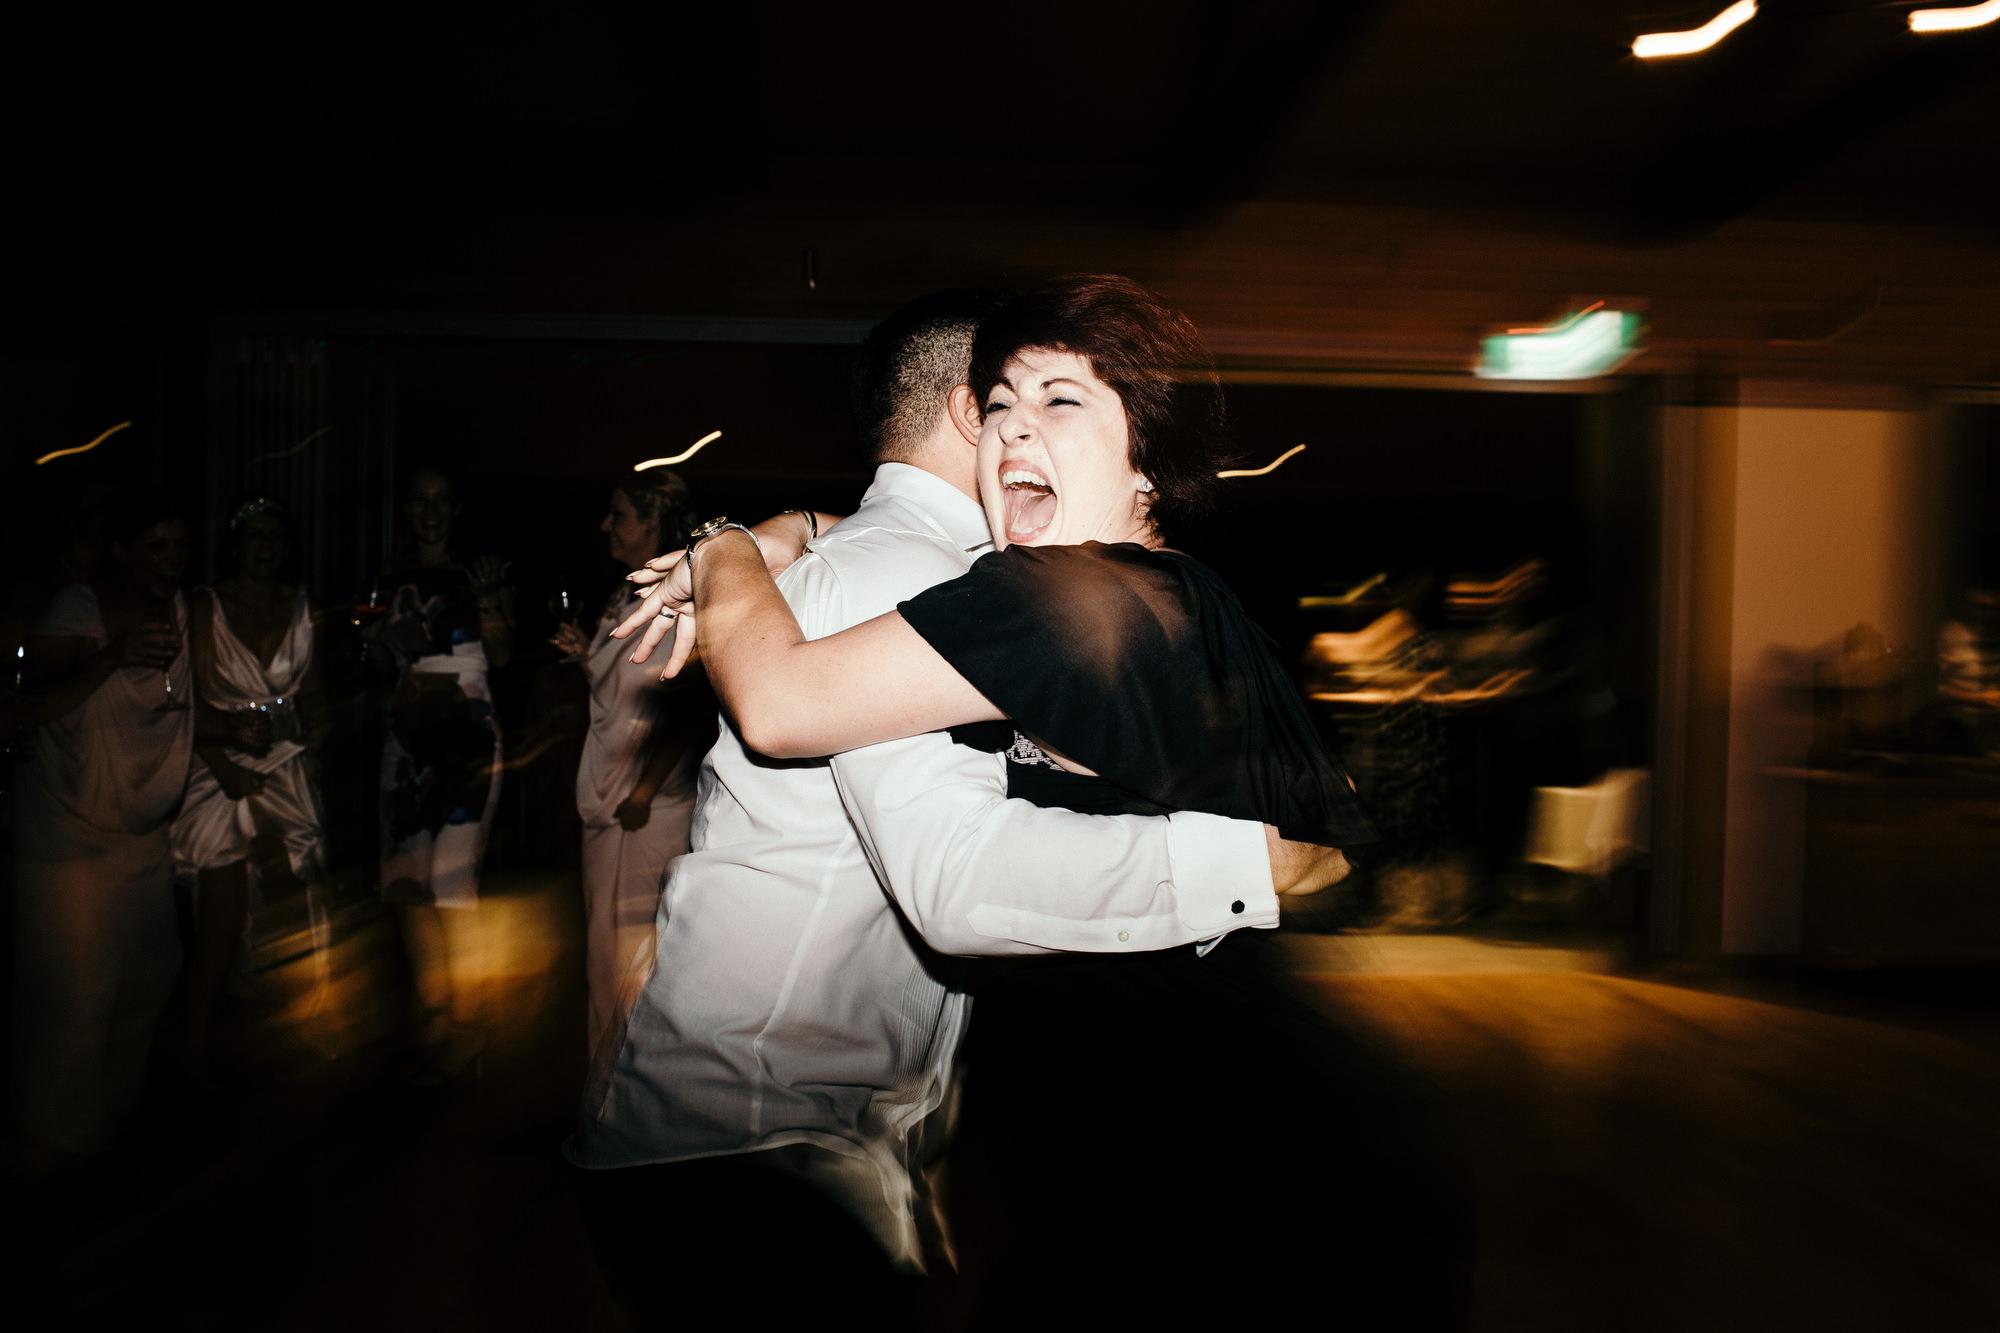 CLARK-WEDDING-EDITH-VALLEY-CARTER-ROSE-PHOTOGRAPHY-856.JPG